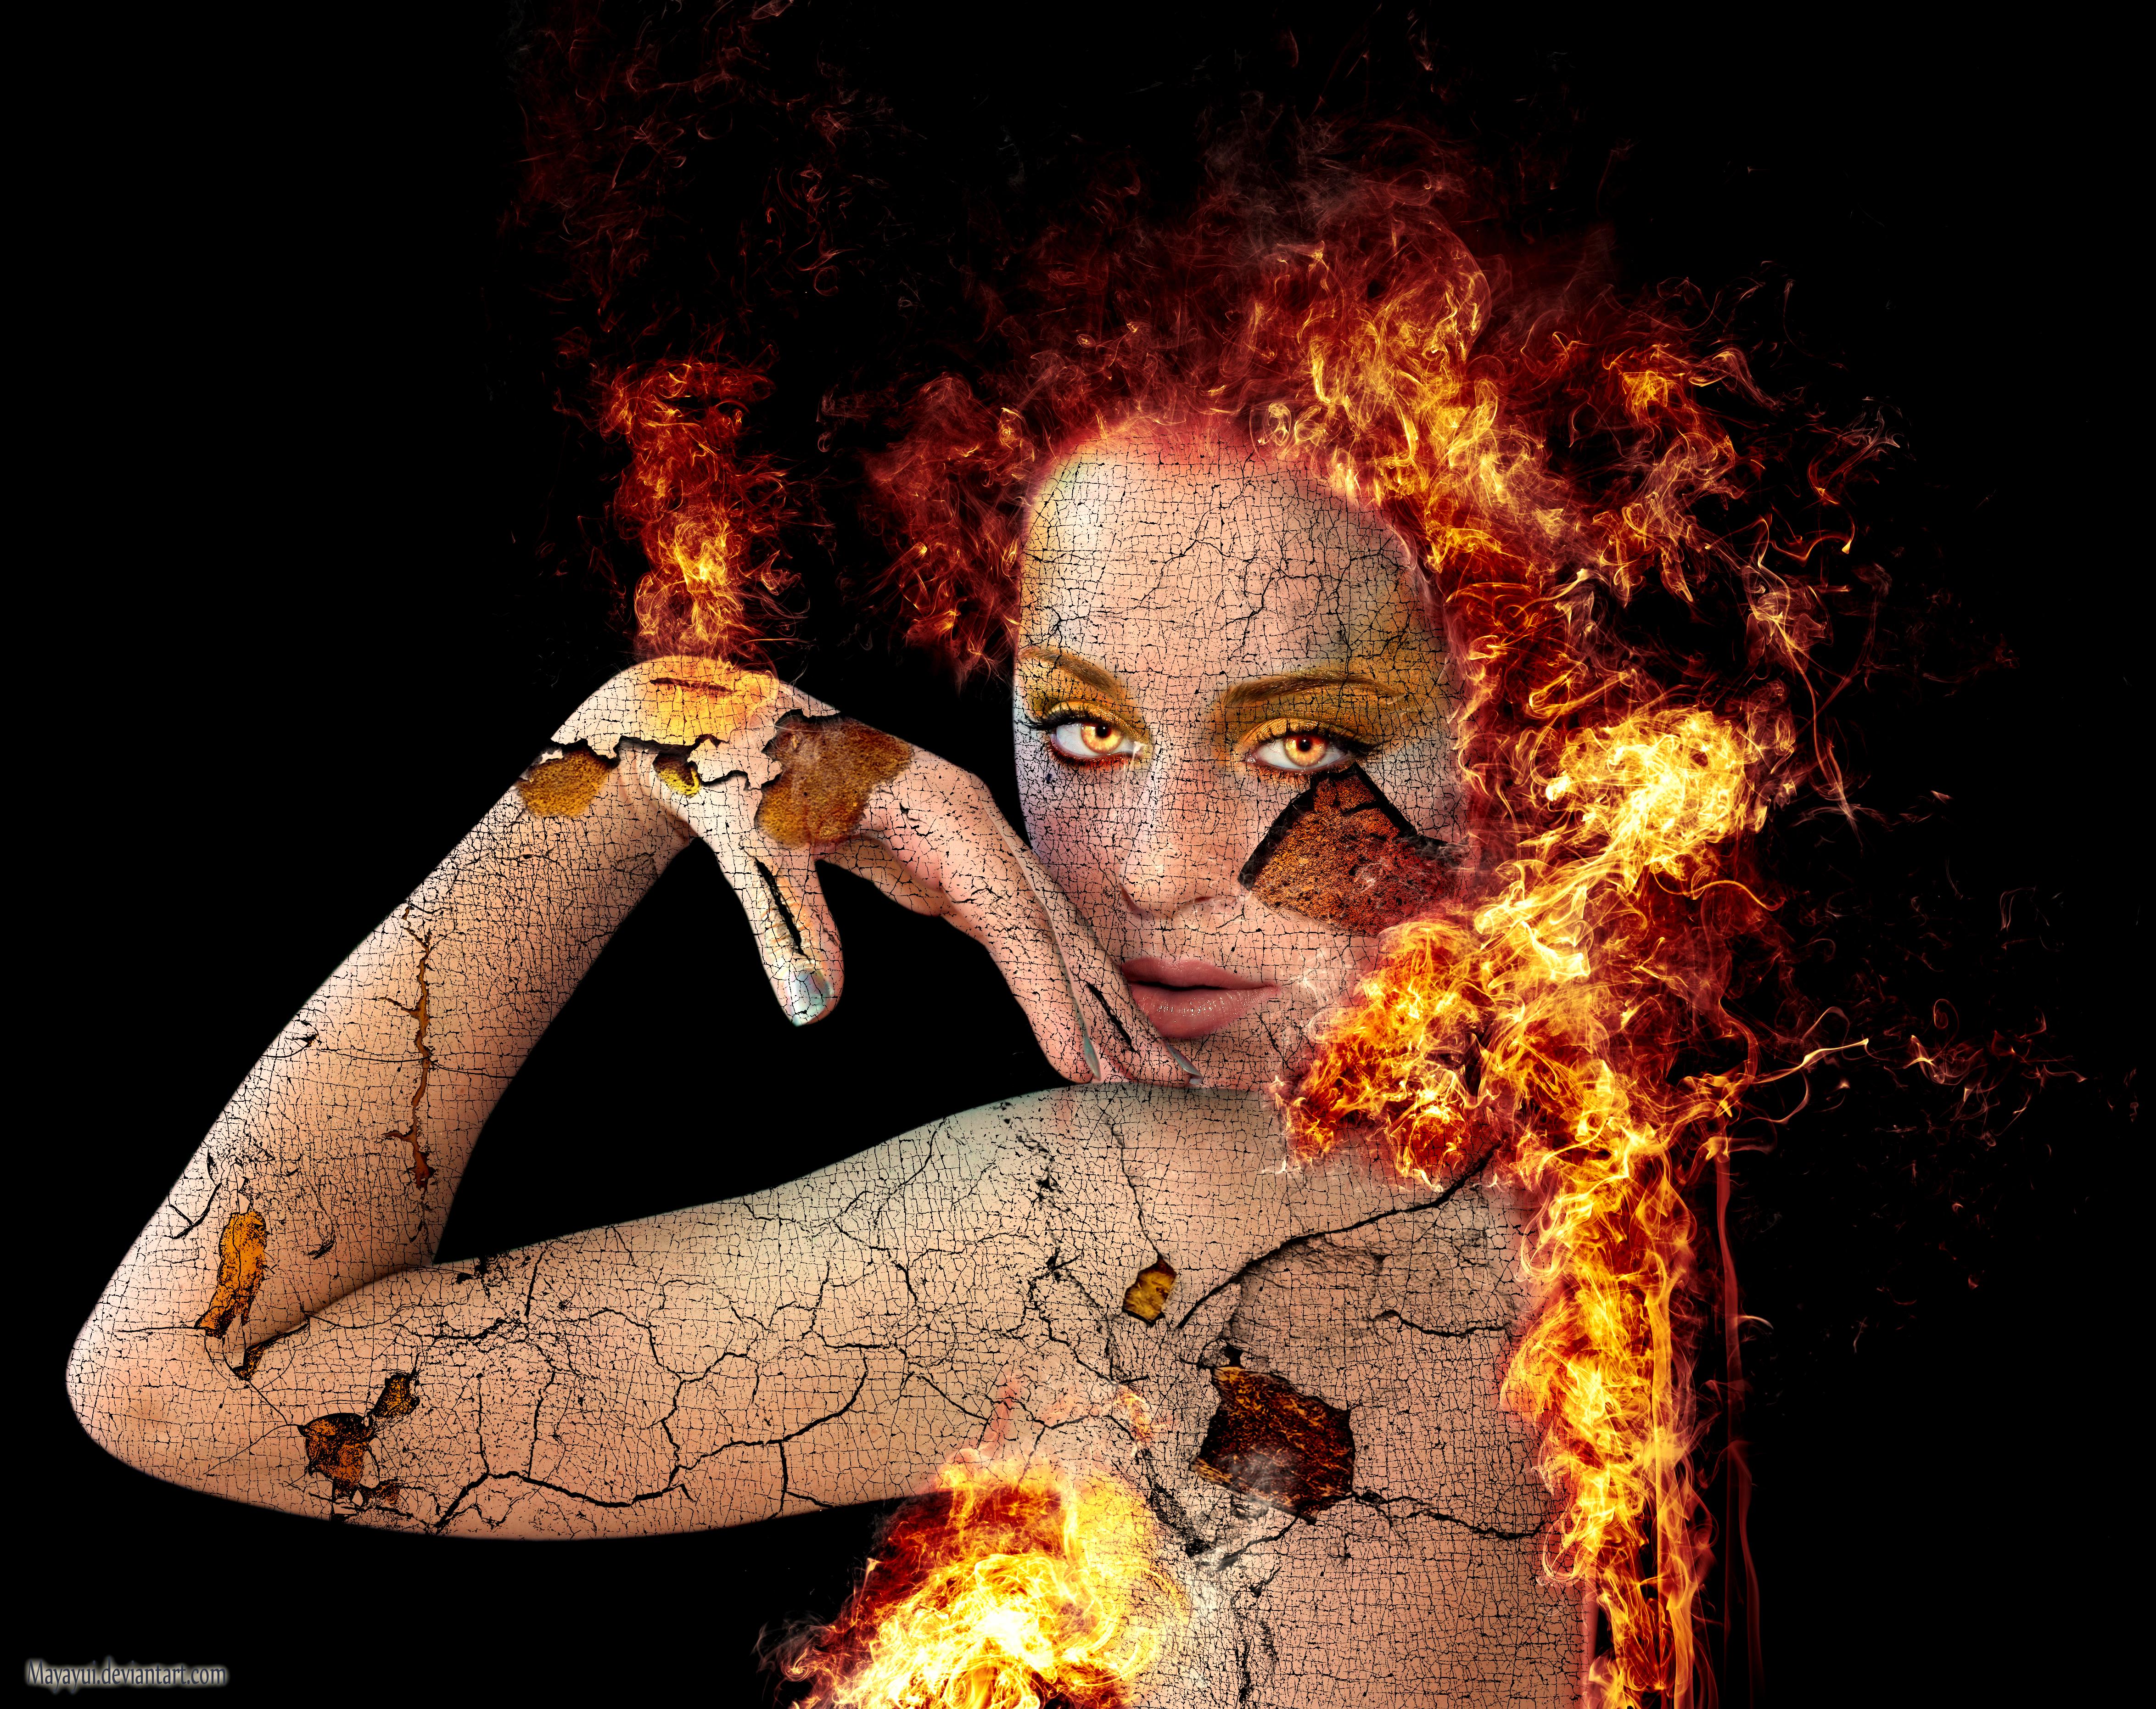 Firewoman by Mayayui